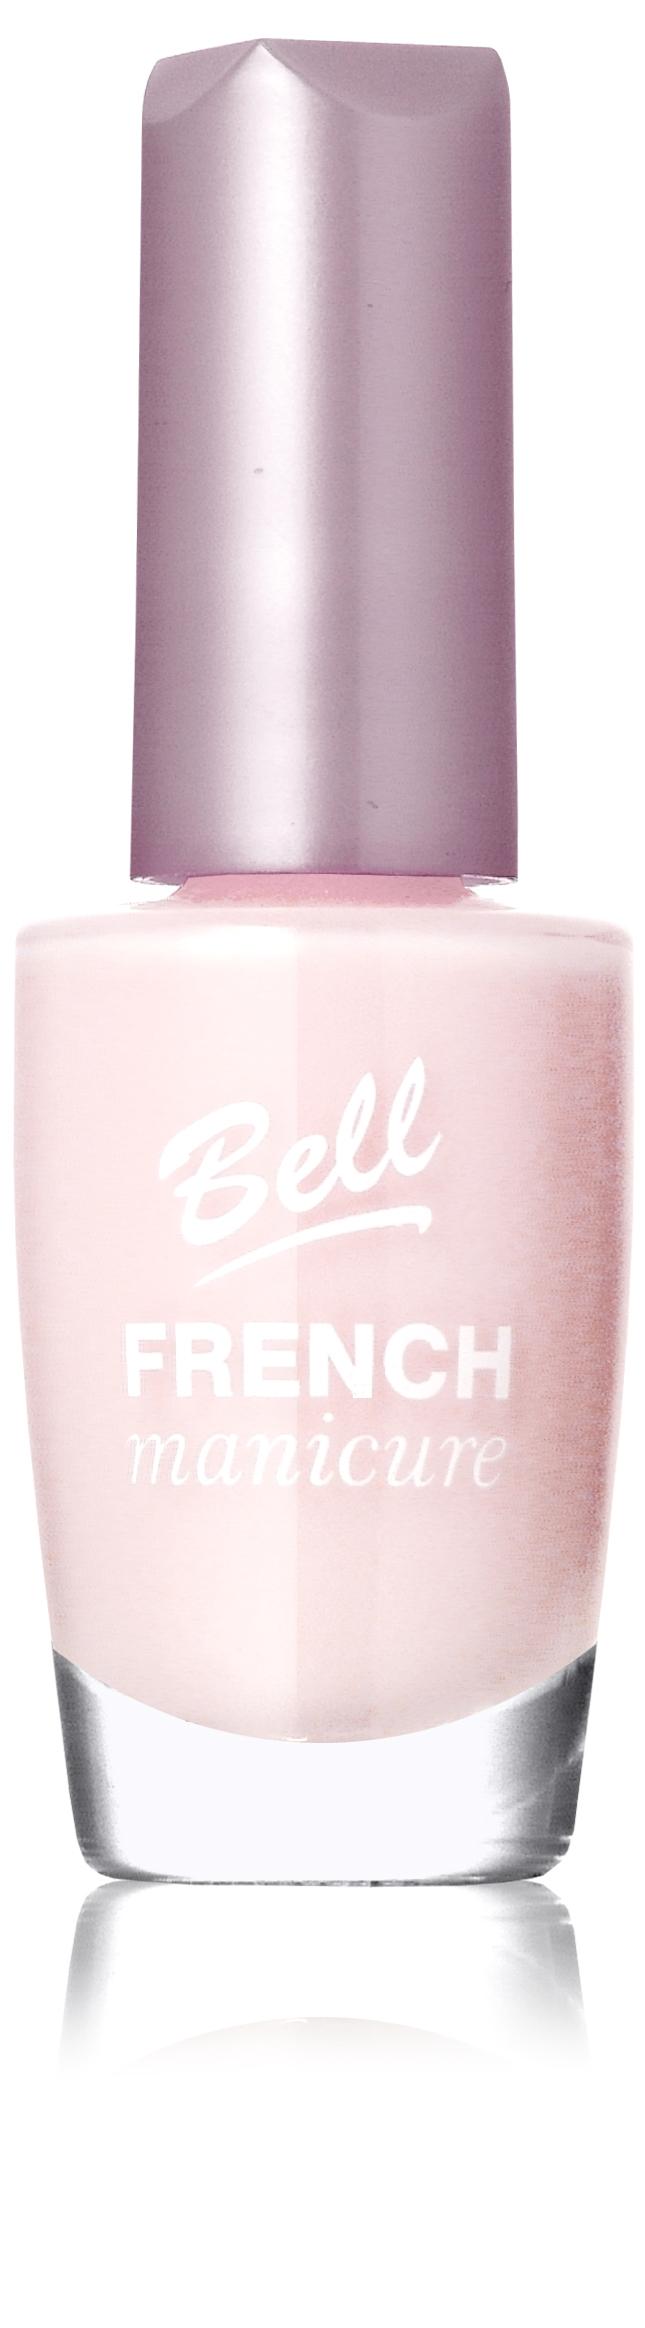 French Manicure Nail Enamel